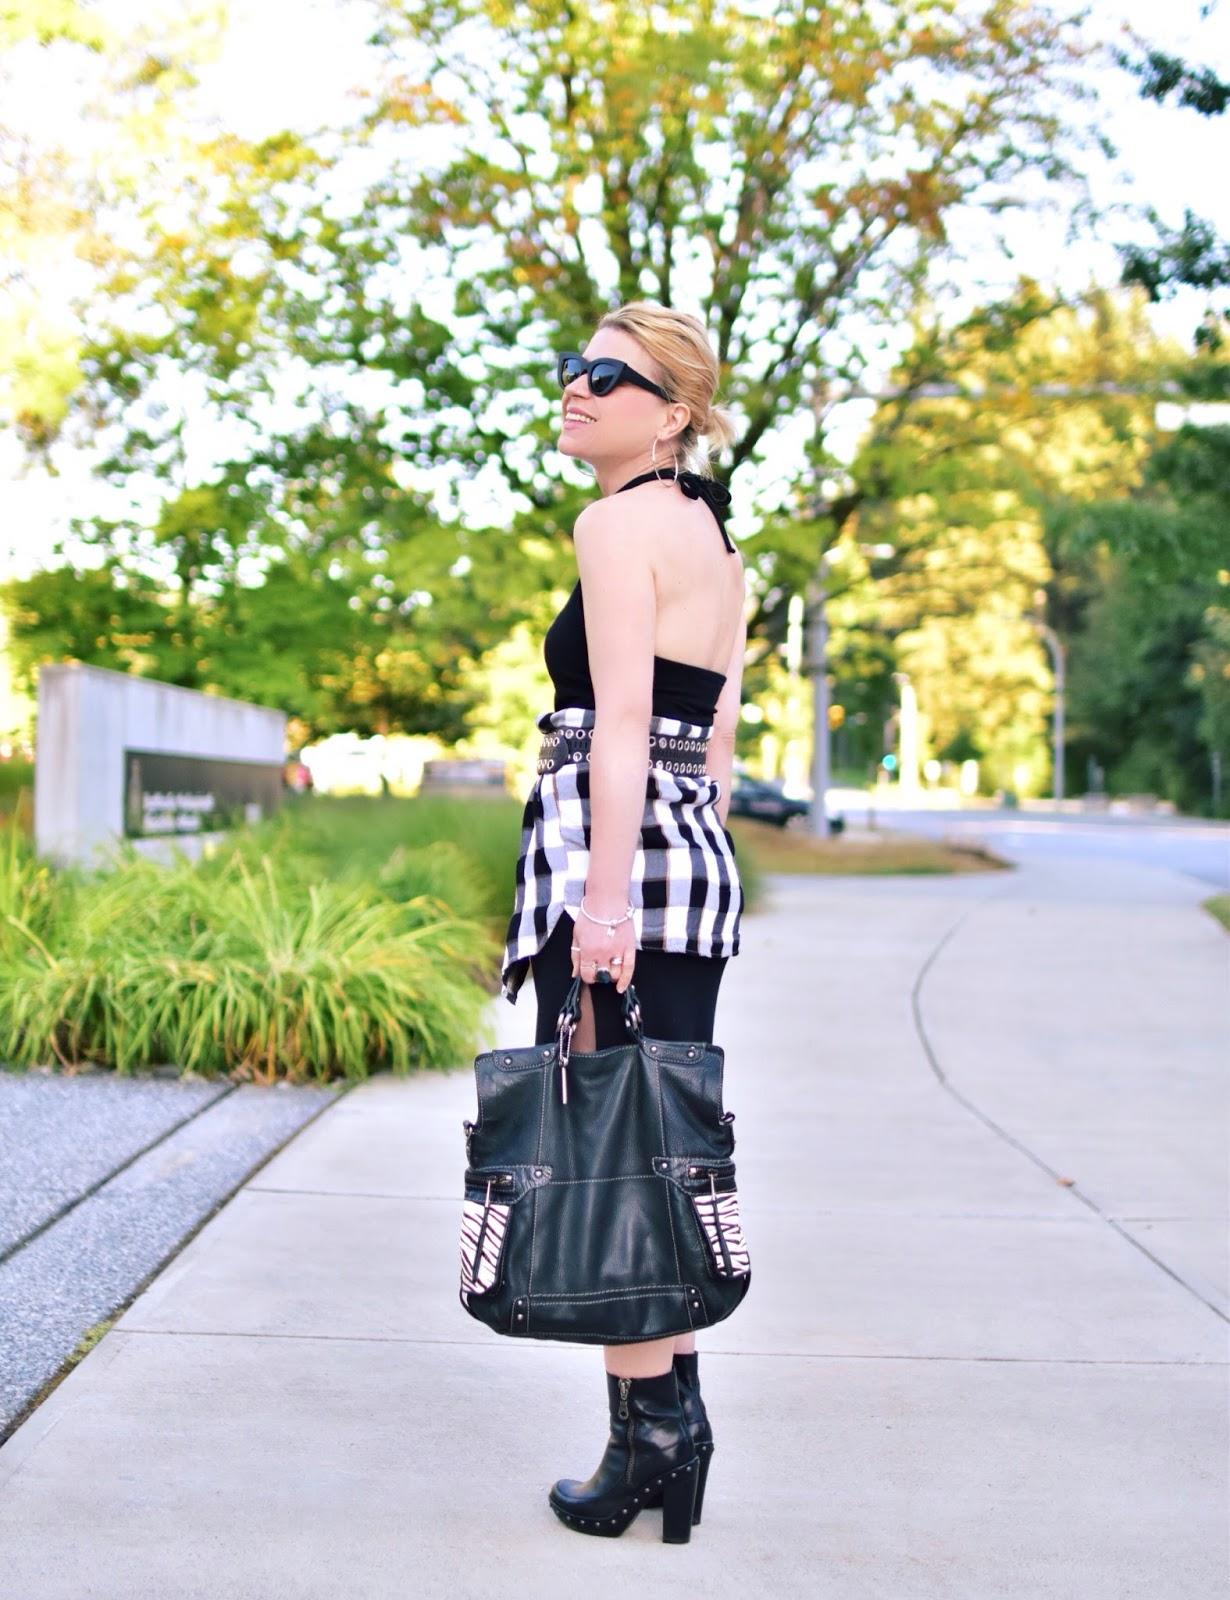 Monika Faulkner styles a halter dress with a waist-wrapped plaid shirt, grommet belt, platform booties, and cat-eye sunglasses